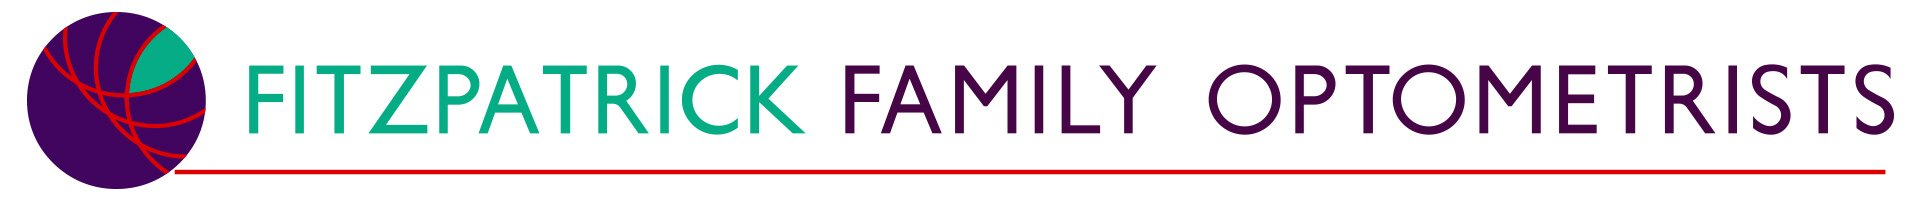 fitzpatrick family optometrists business logo new